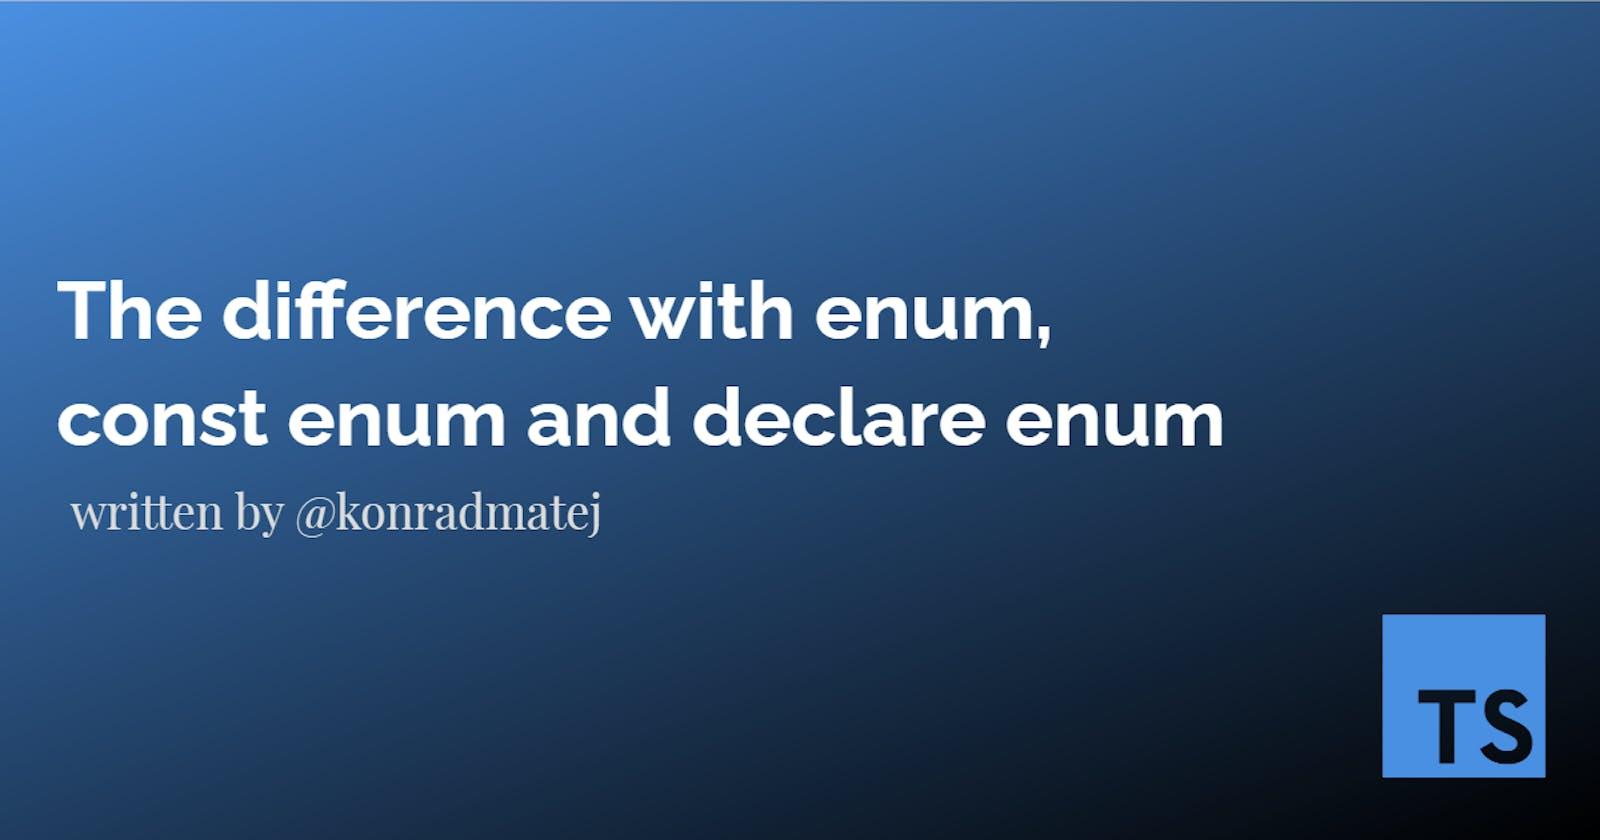 The difference between enum, const enum and declare enum in Typescript